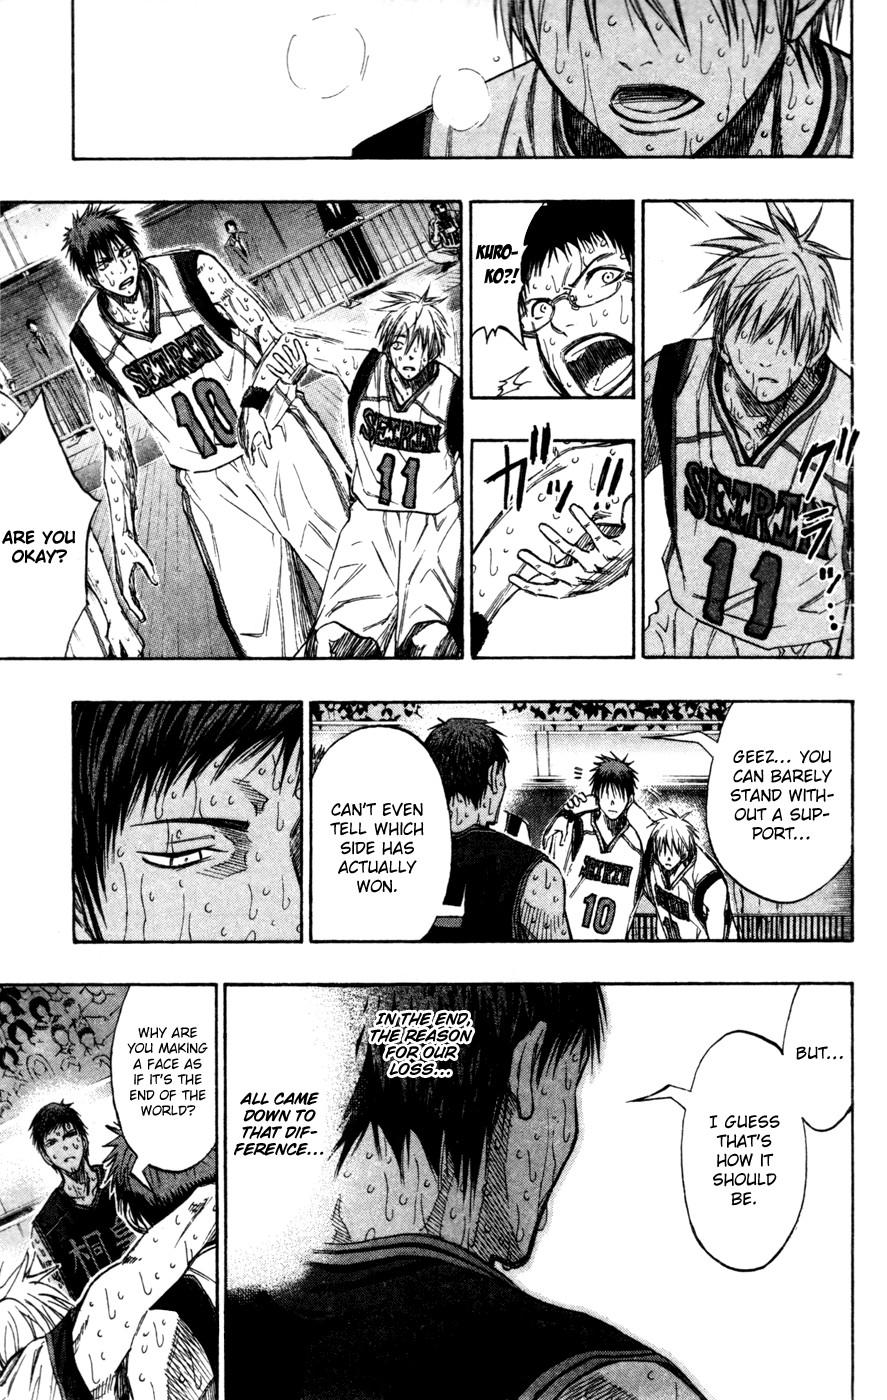 Kuroko no Basket Manga Chapter 139 - Image 11